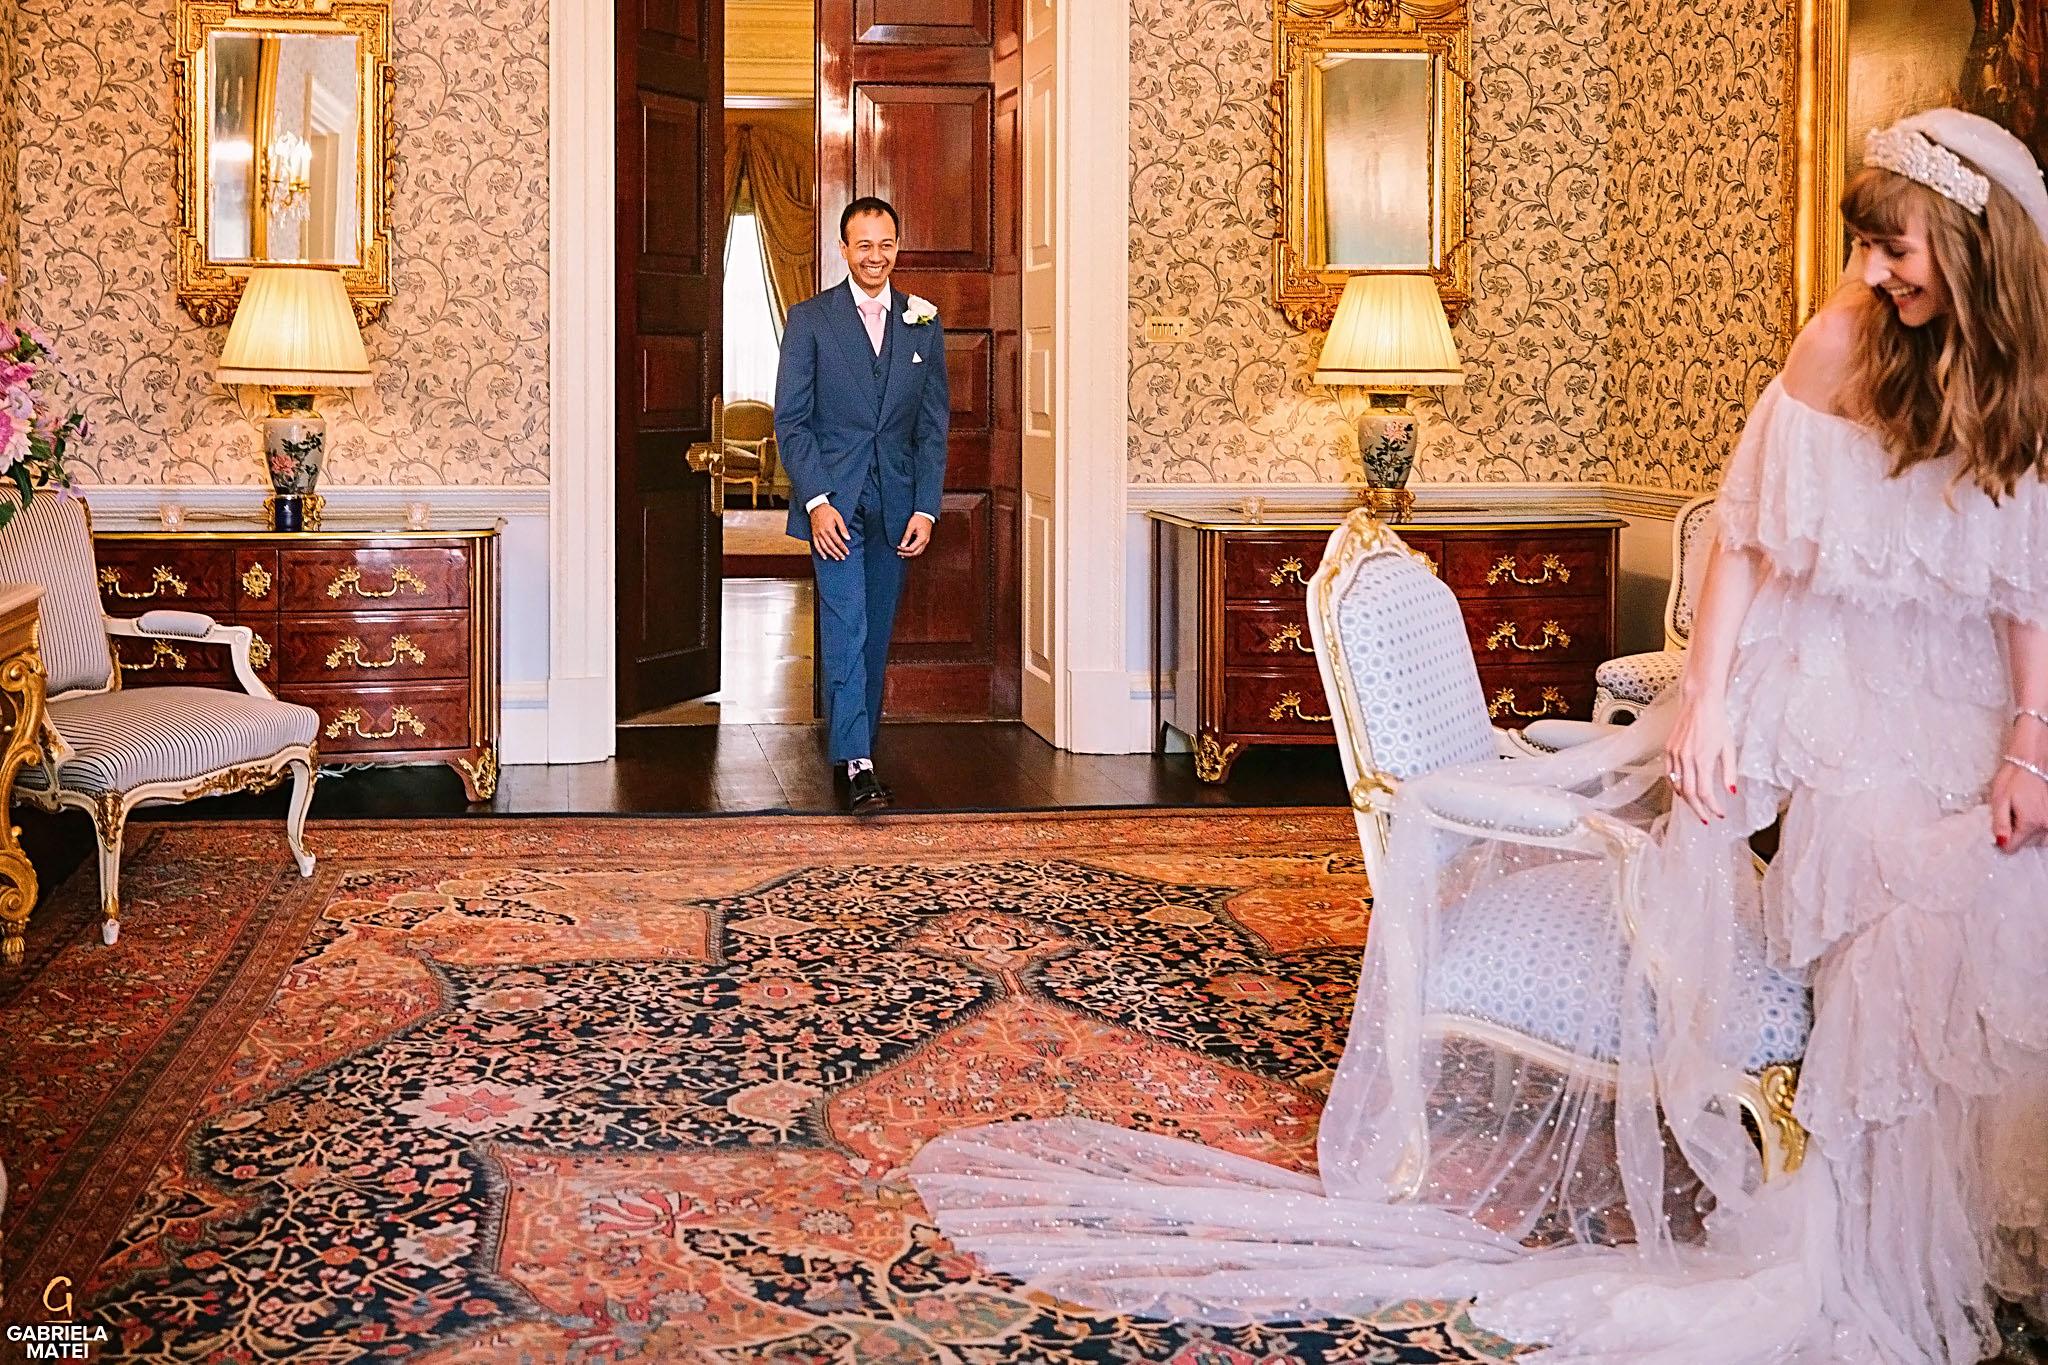 Groom walking in Queen Elisabeth Room to meet his bride at The Ritz hotel in London